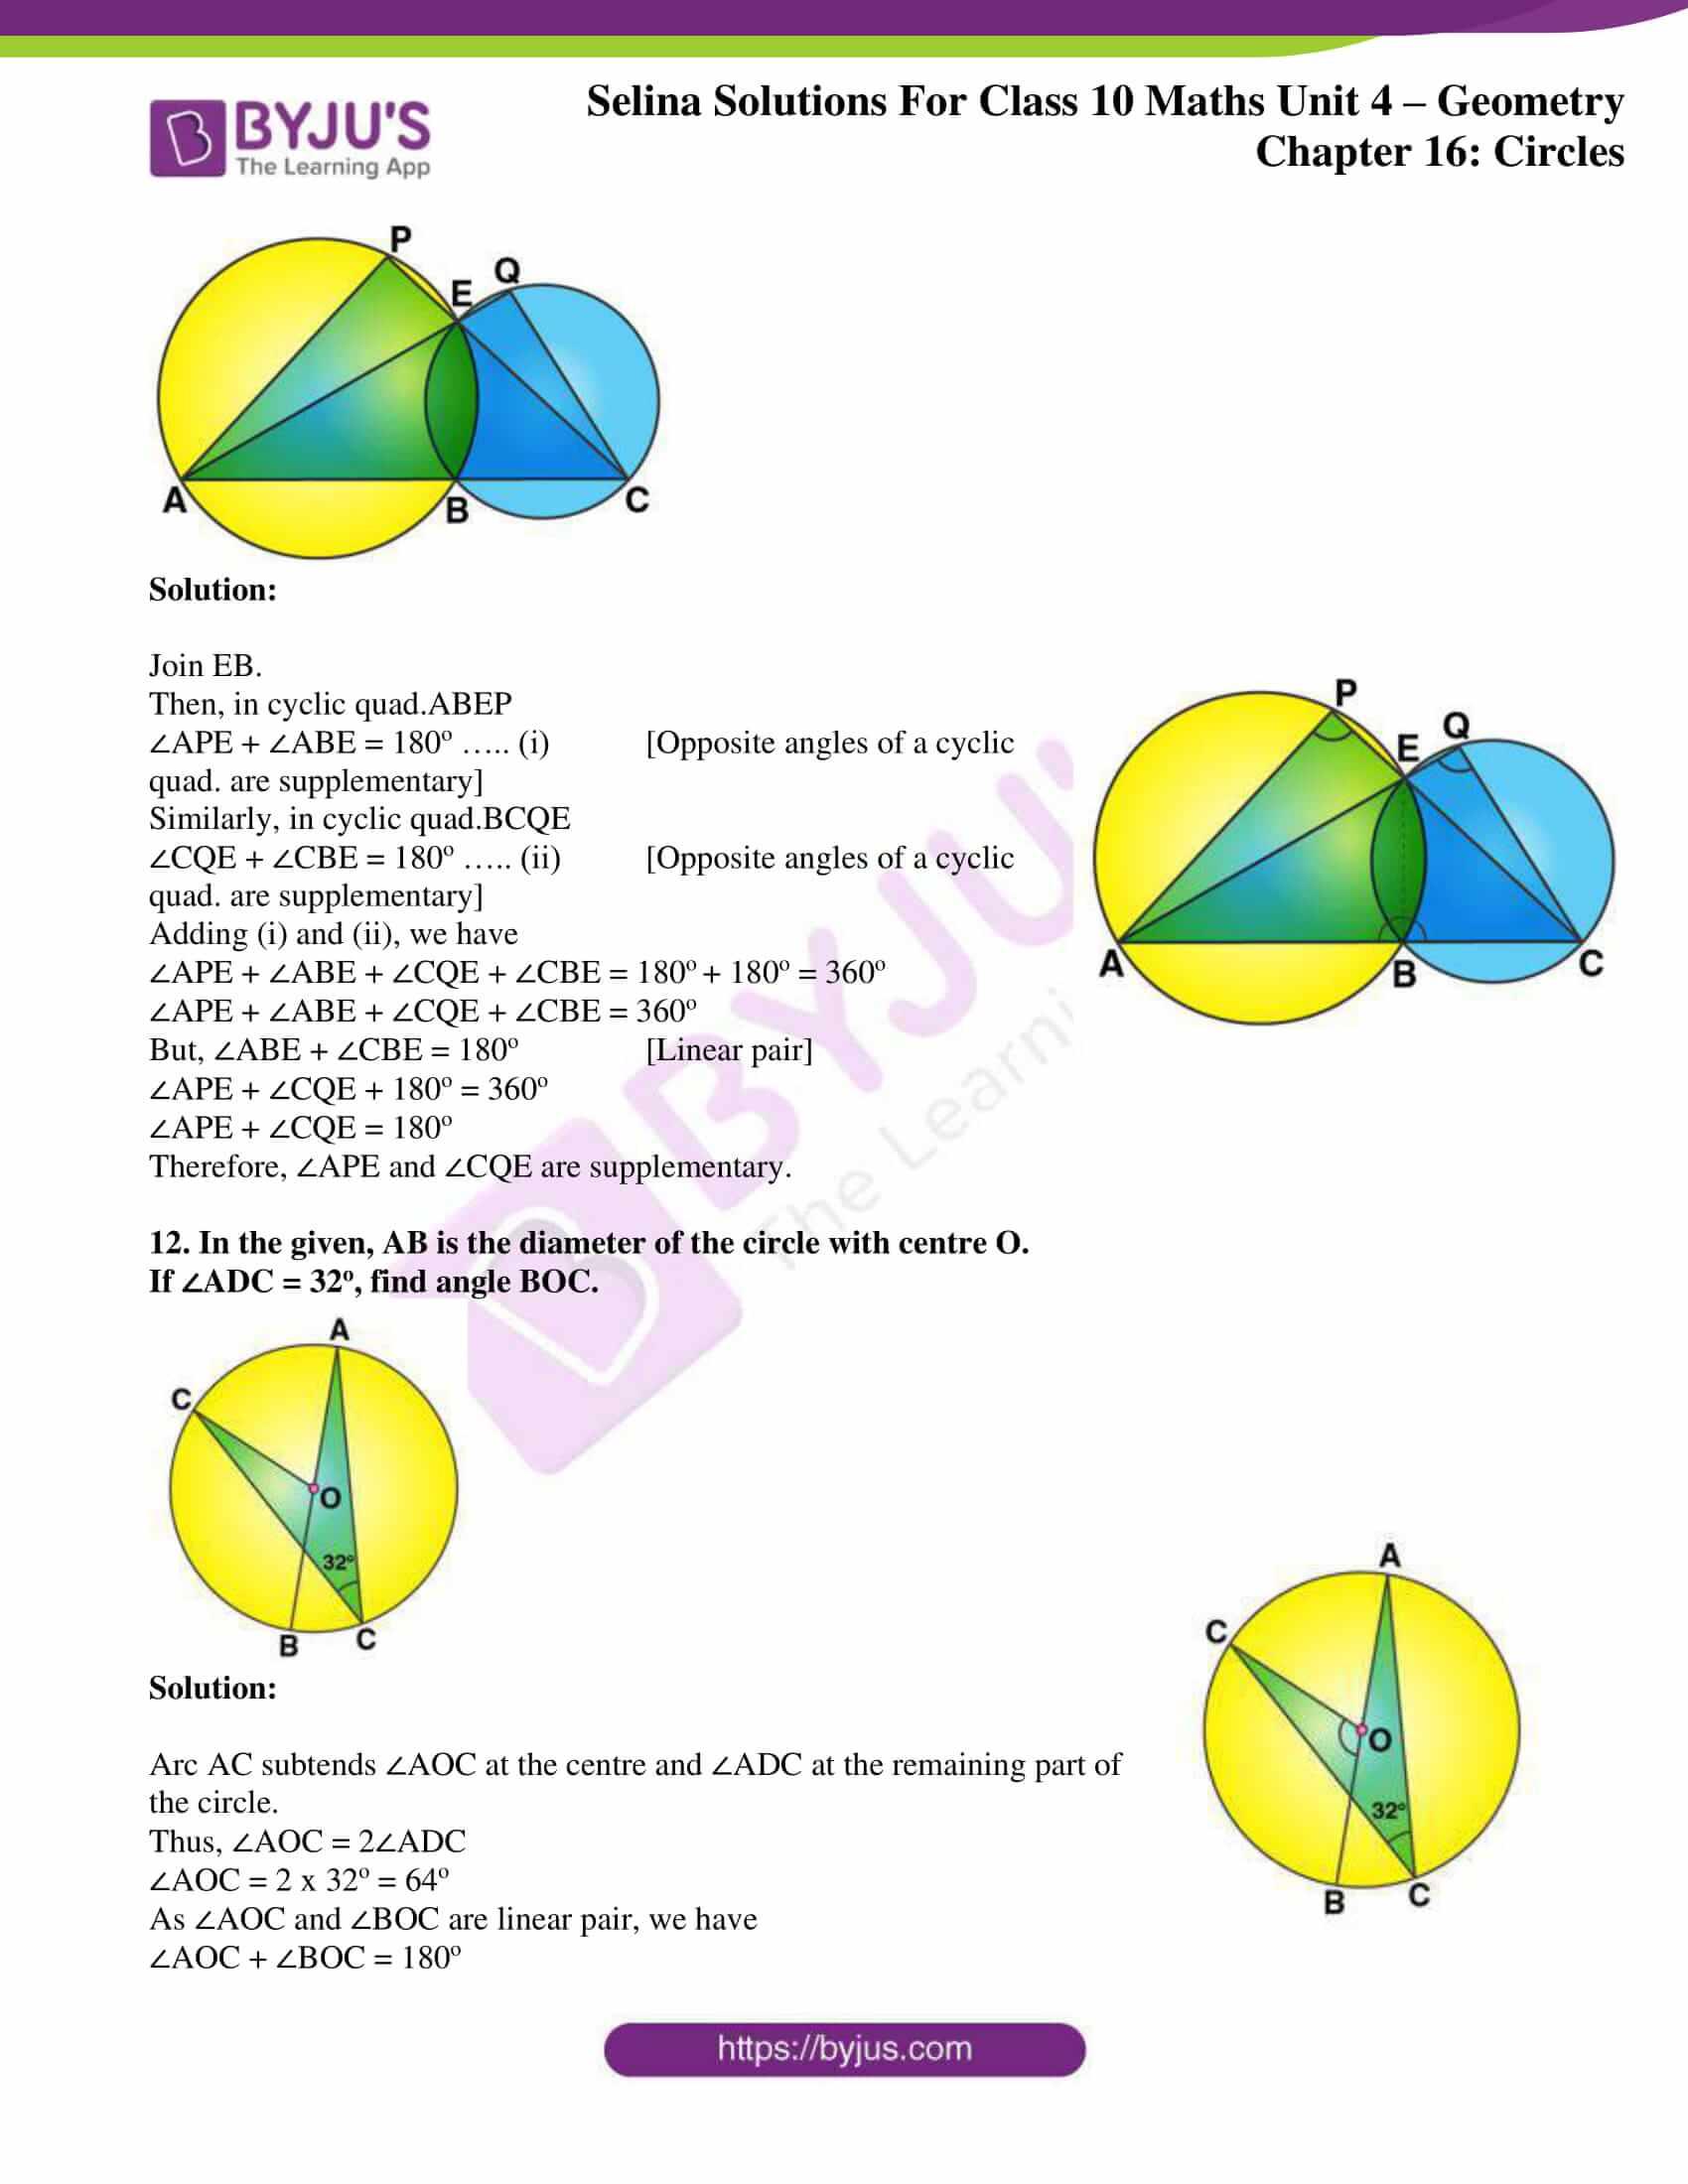 selina-sol-maths-class-10-ch-17-ex-c-8